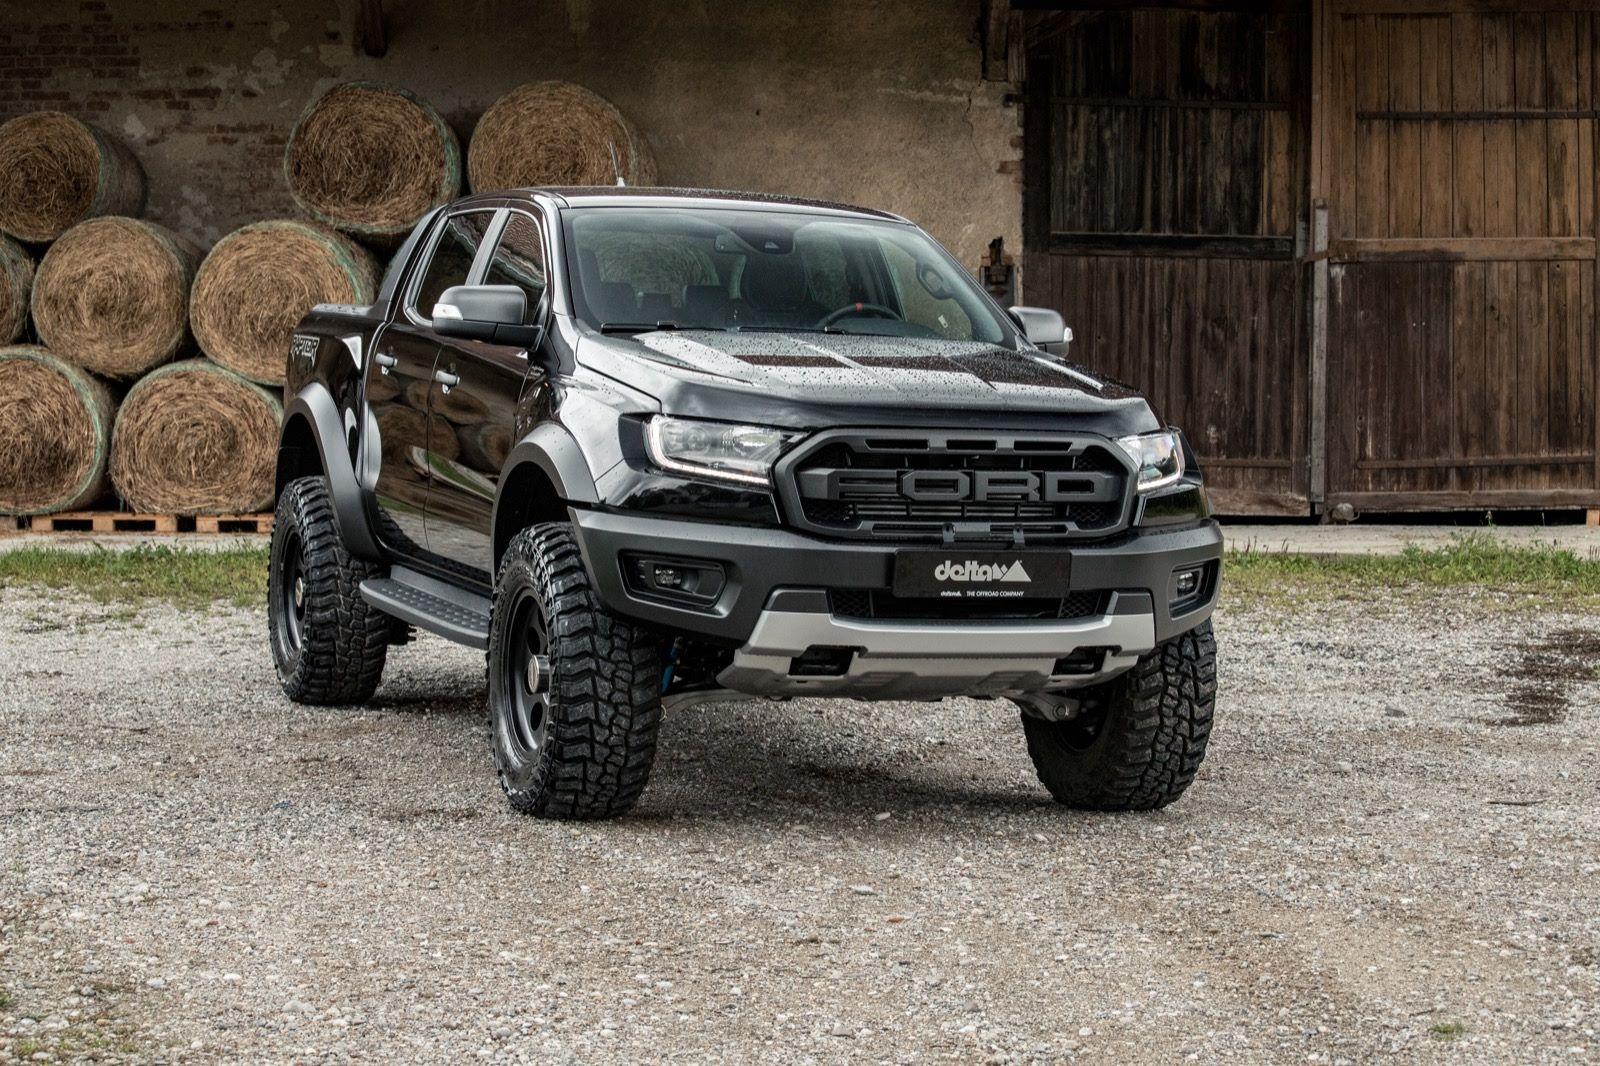 Ford-Ranger-Raptor-by-Delta-4x4-11